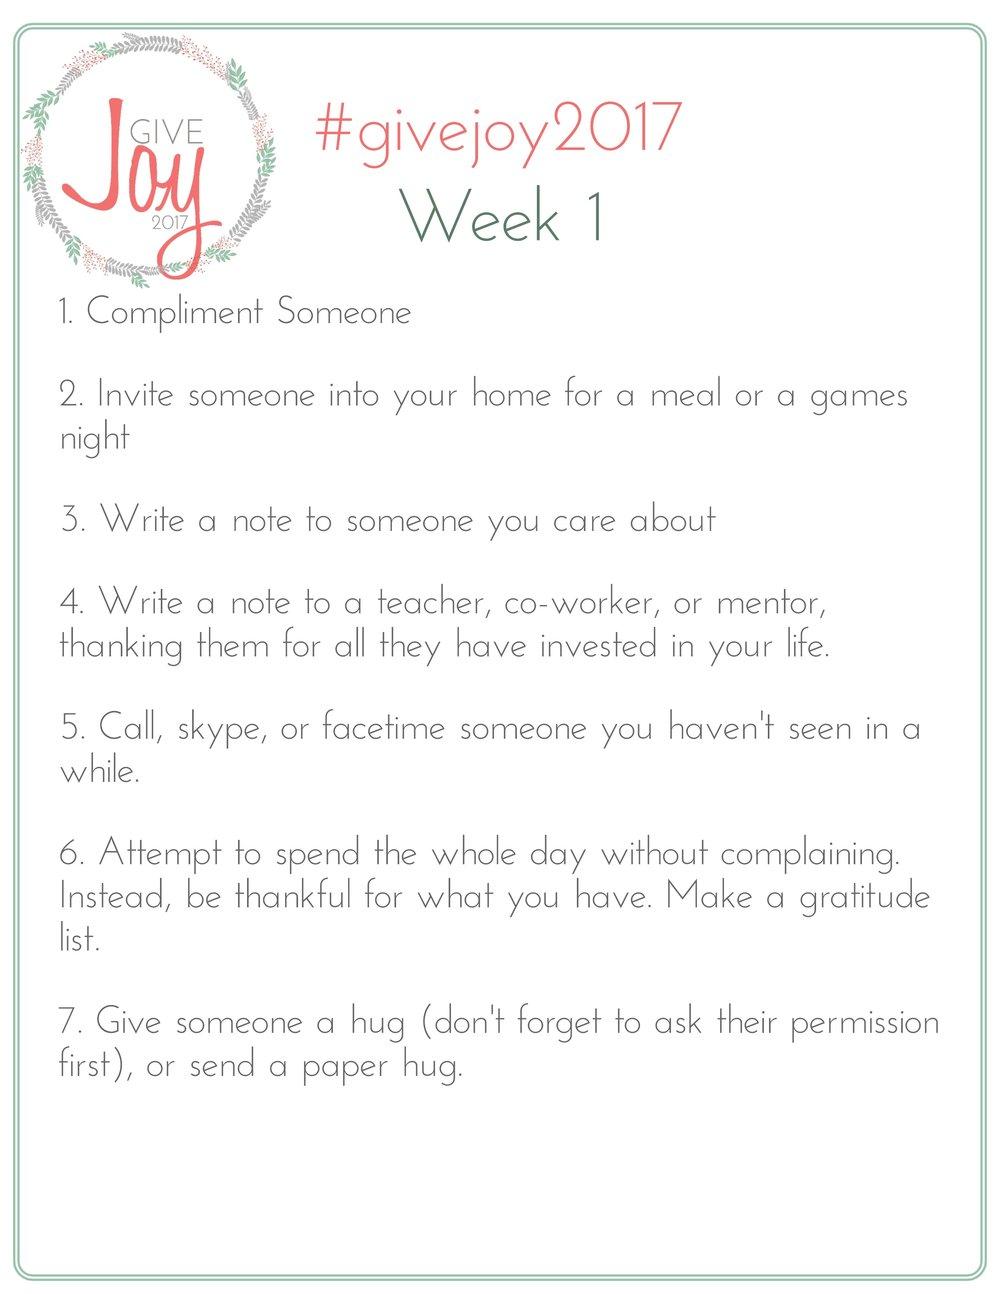 Give Joy 2017 Week 1 List of Challenges.jpeg